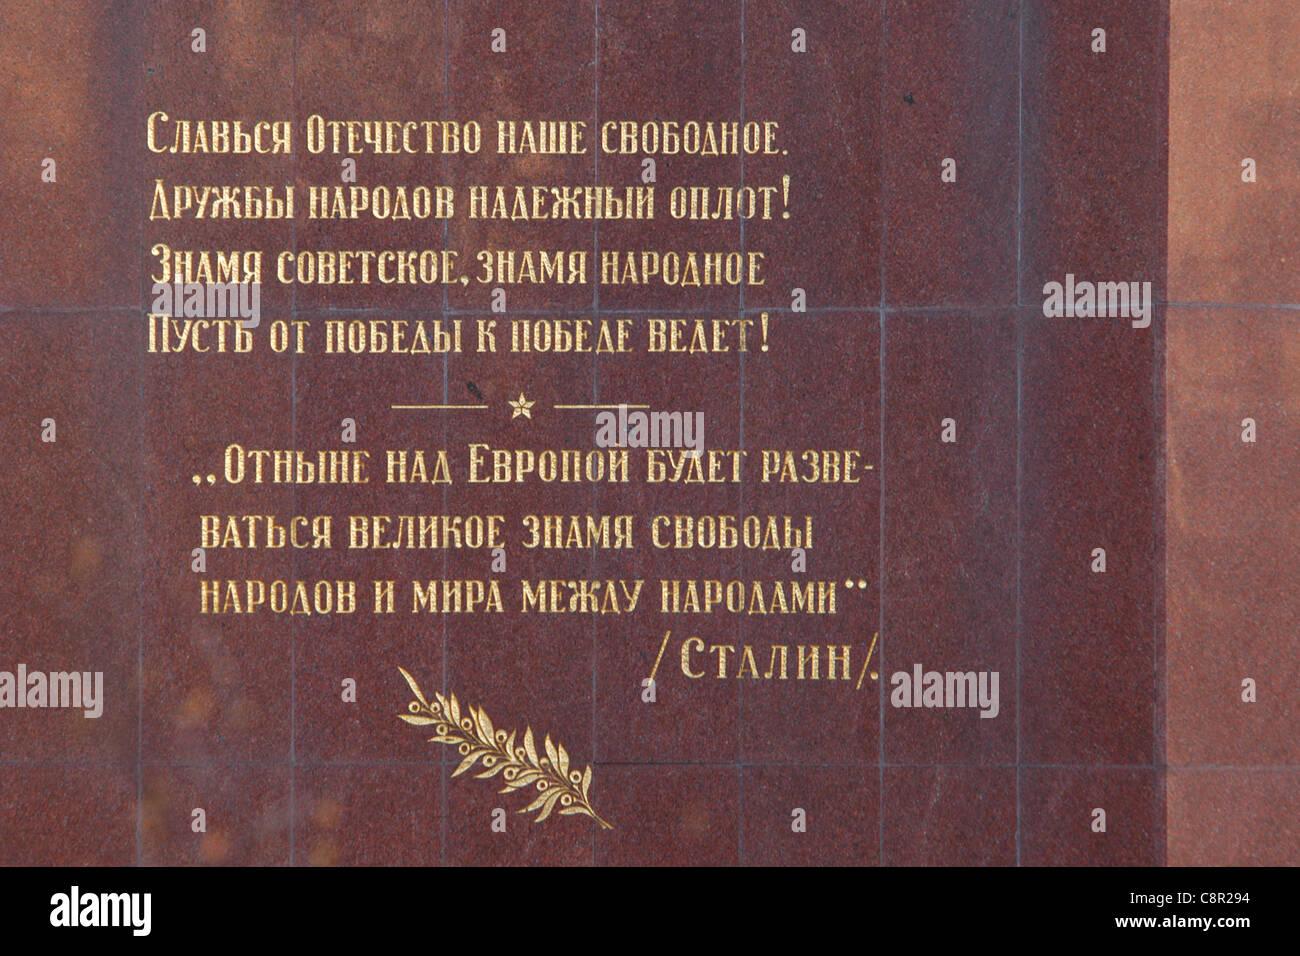 Quote from Joseph Stalin at the wall of the Soviet War Memorial at Schwarzenbergplatz in Vienna, Austria. Stock Photo